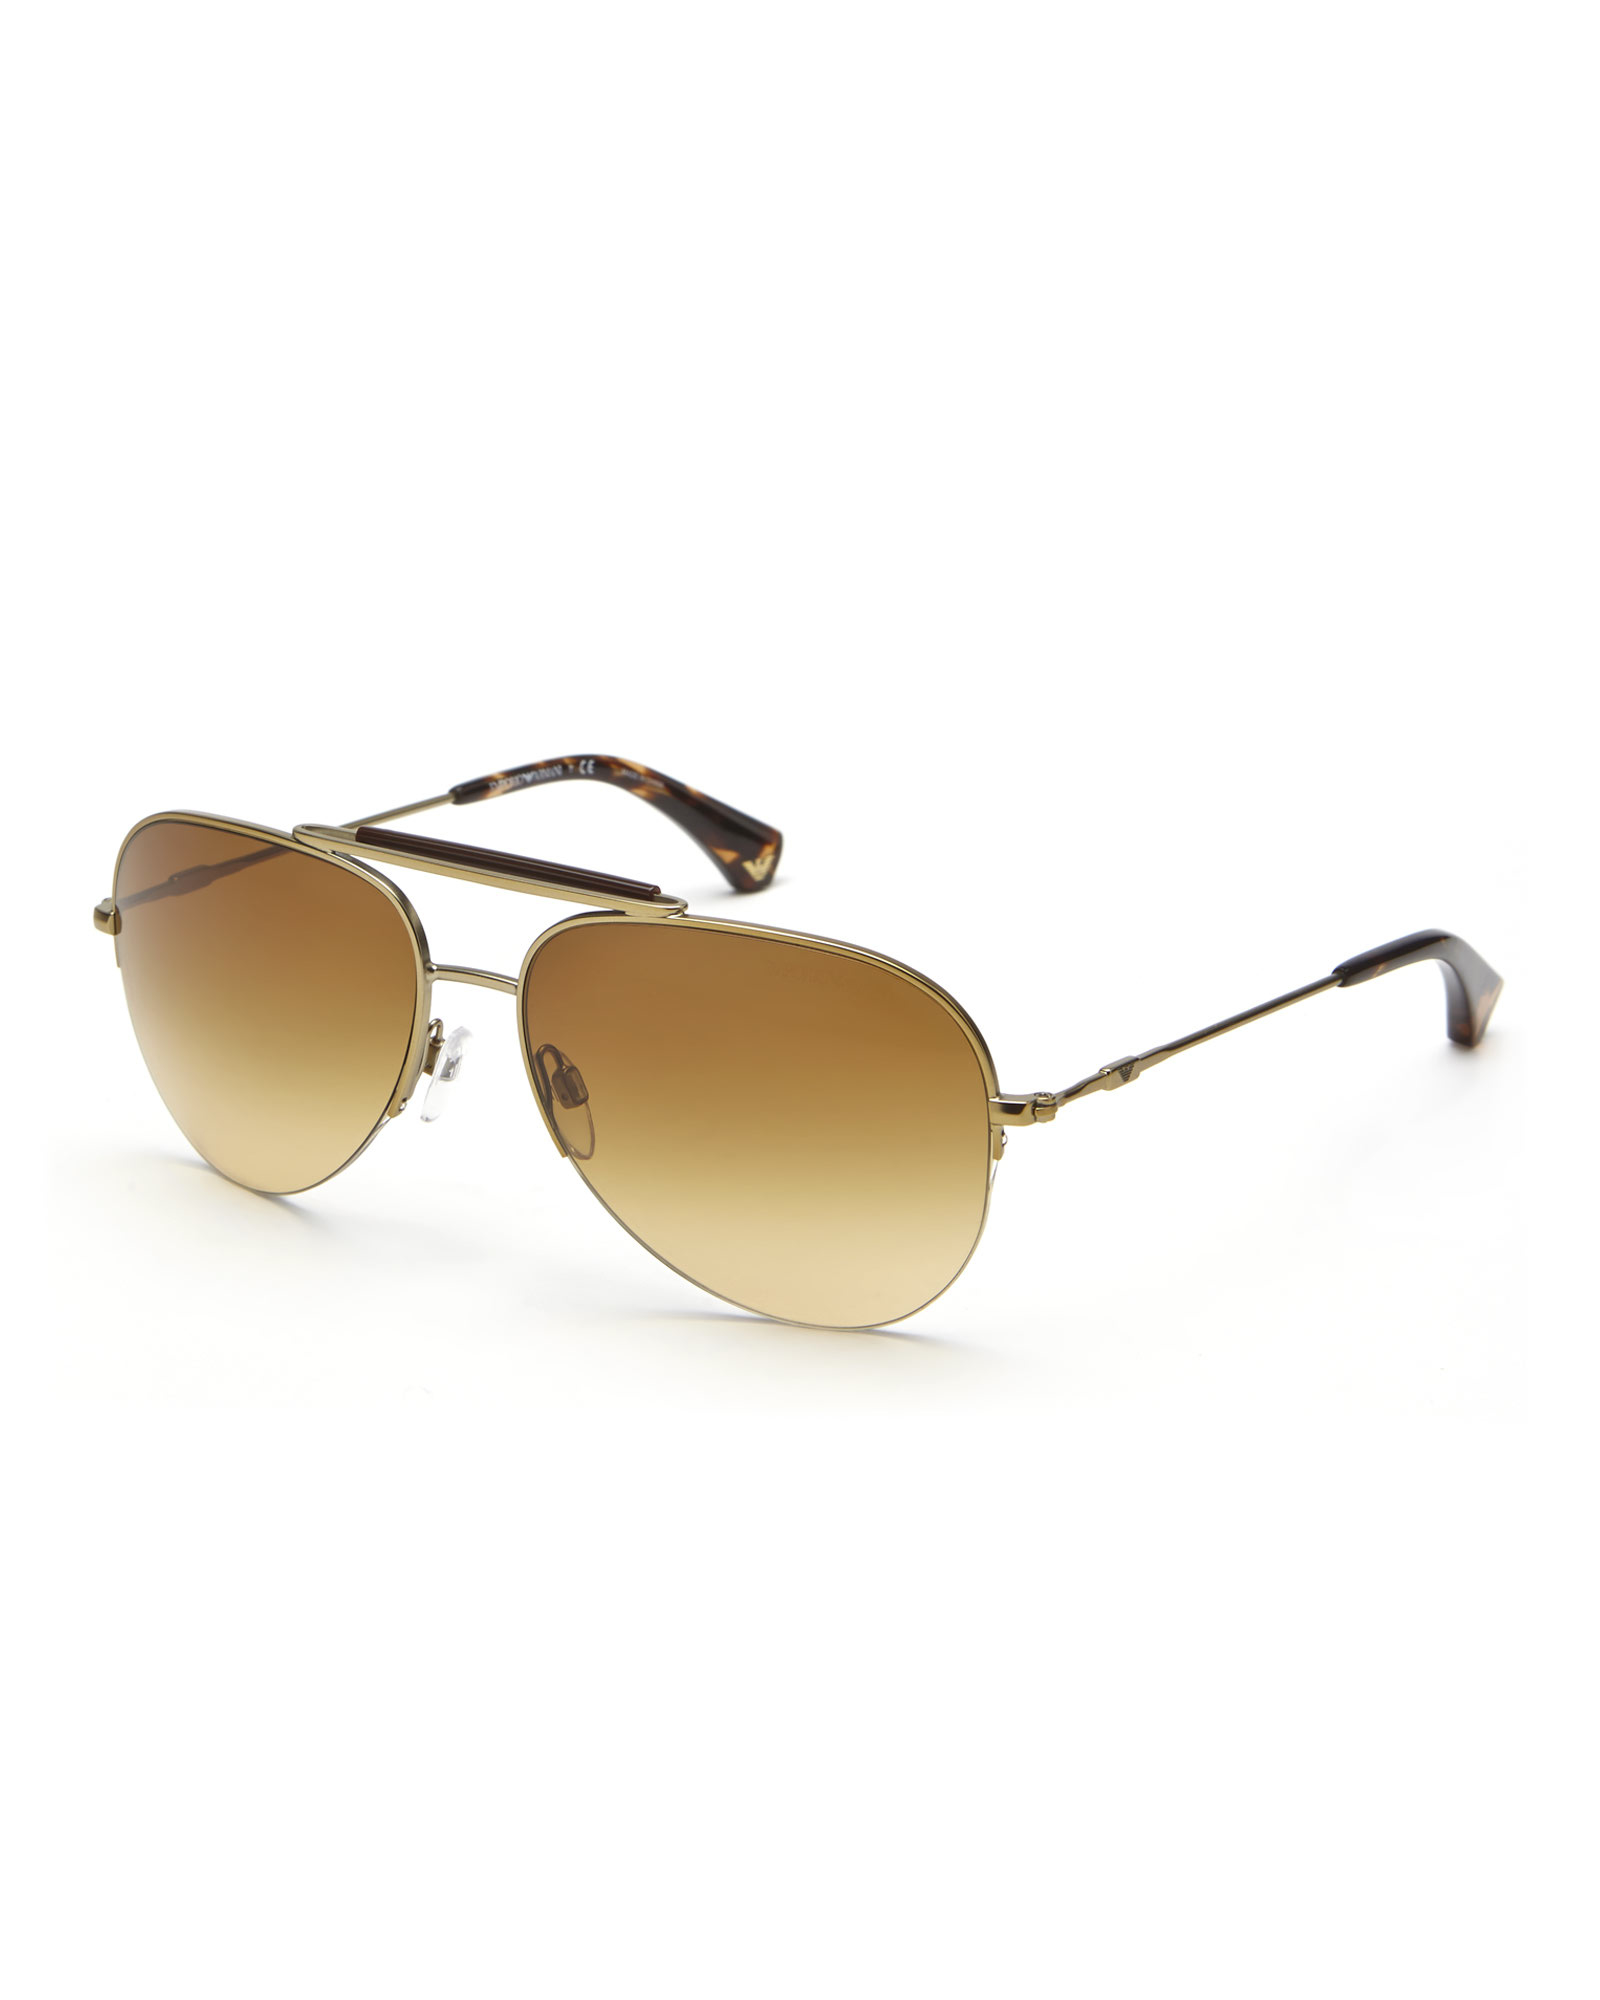 3fe13dcc8aac metallic aviator sunglasses armani